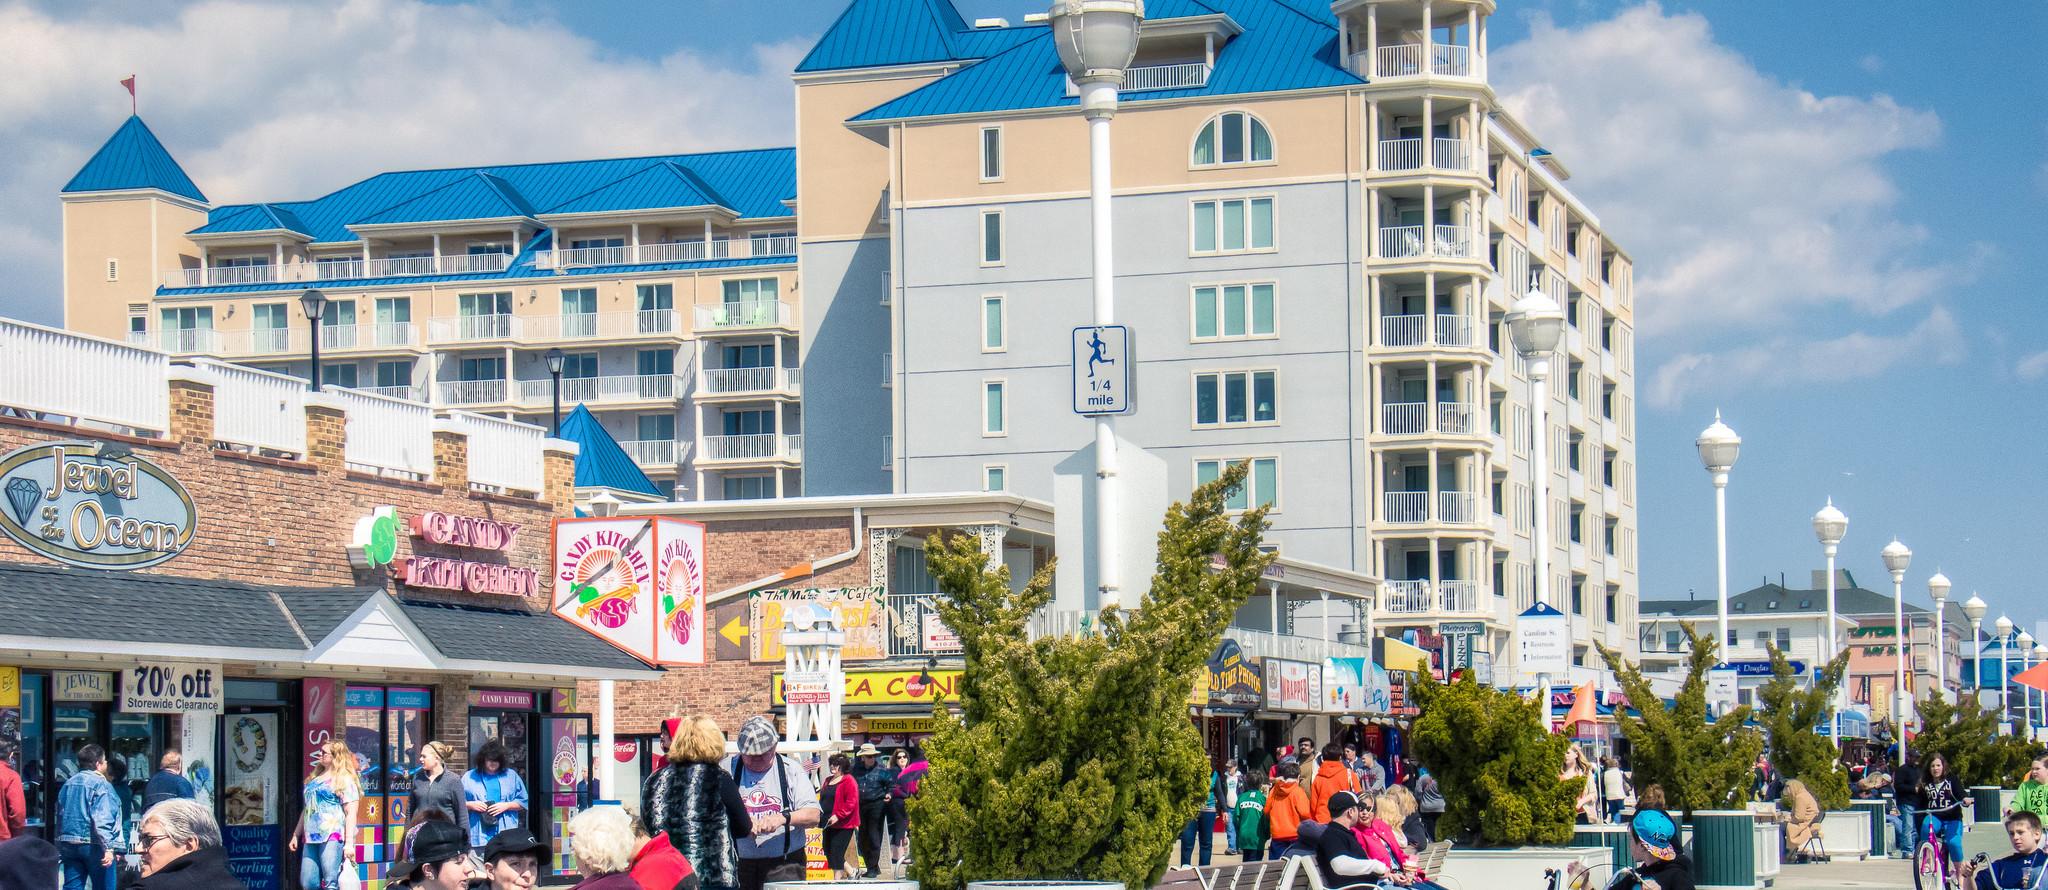 Defender Resorts Boardwalk Vacation Club Loans